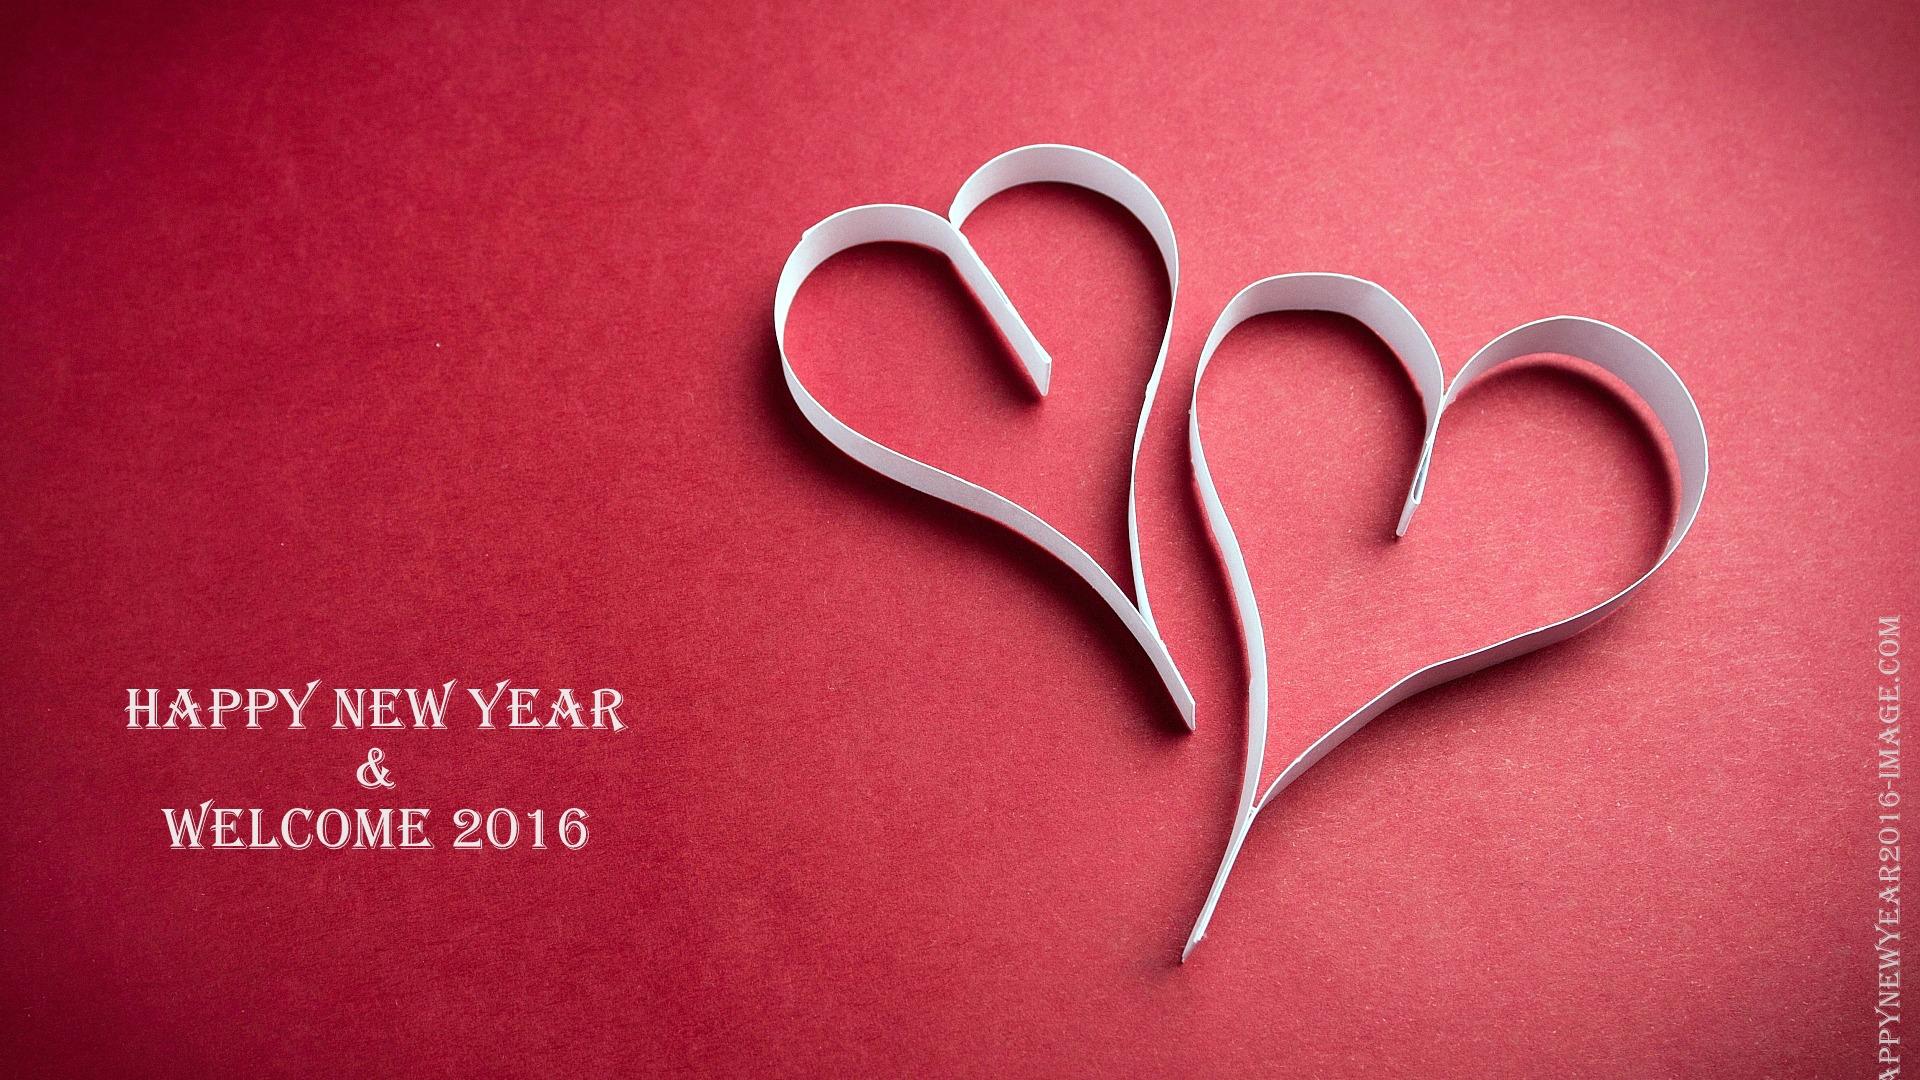 Happy New Year 2016 Hd Desktop Wallpaper 18 Preview 10wallpaper Com